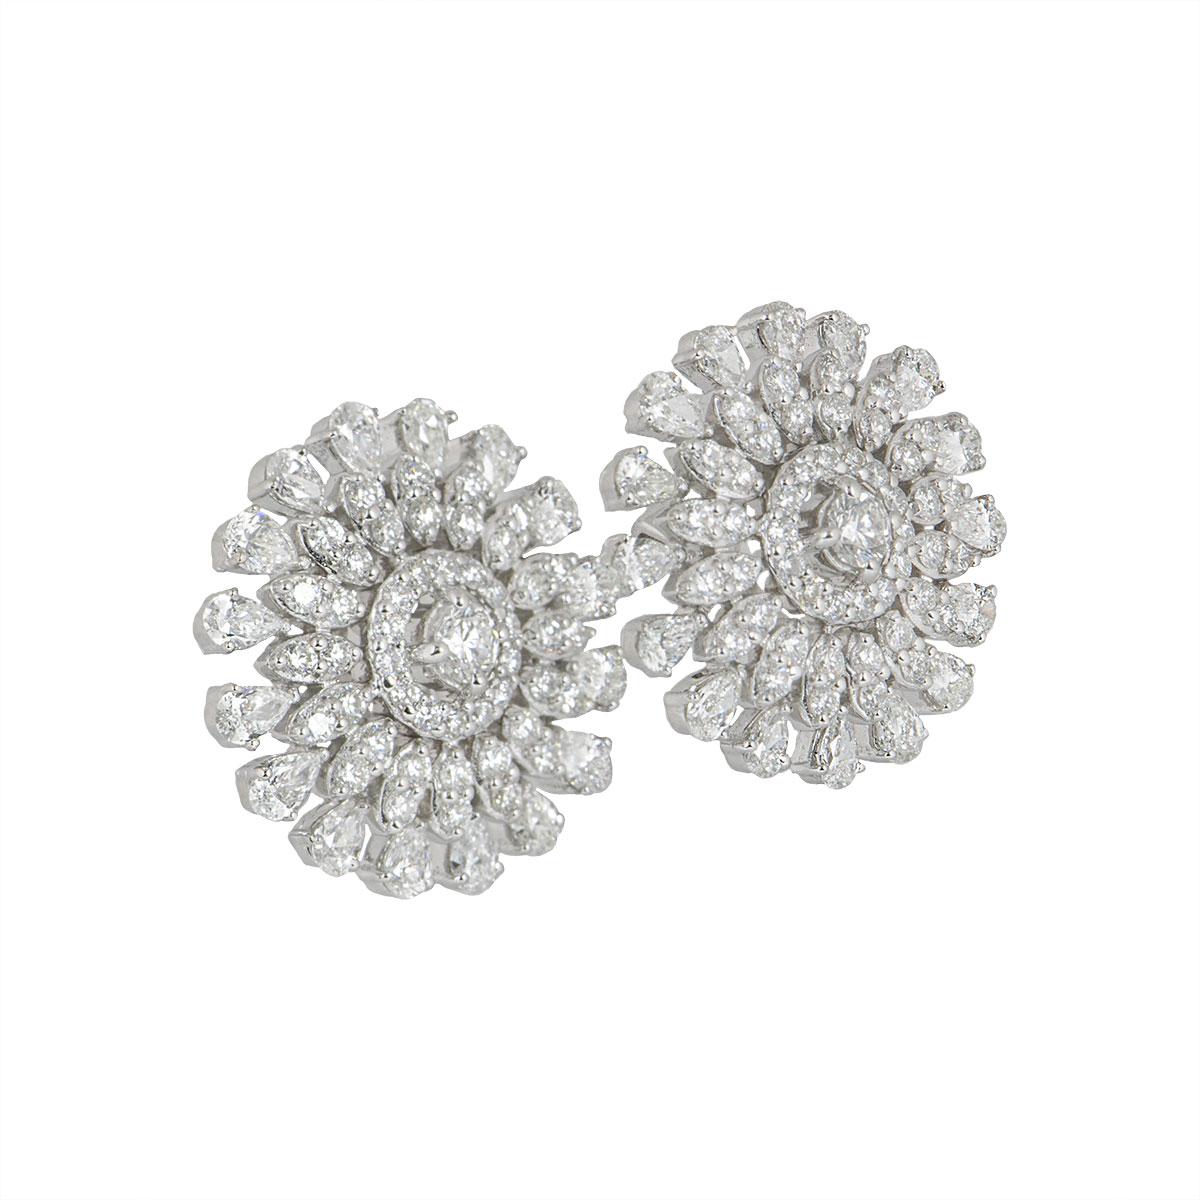 White Gold Diamond Earrings 3.15ct